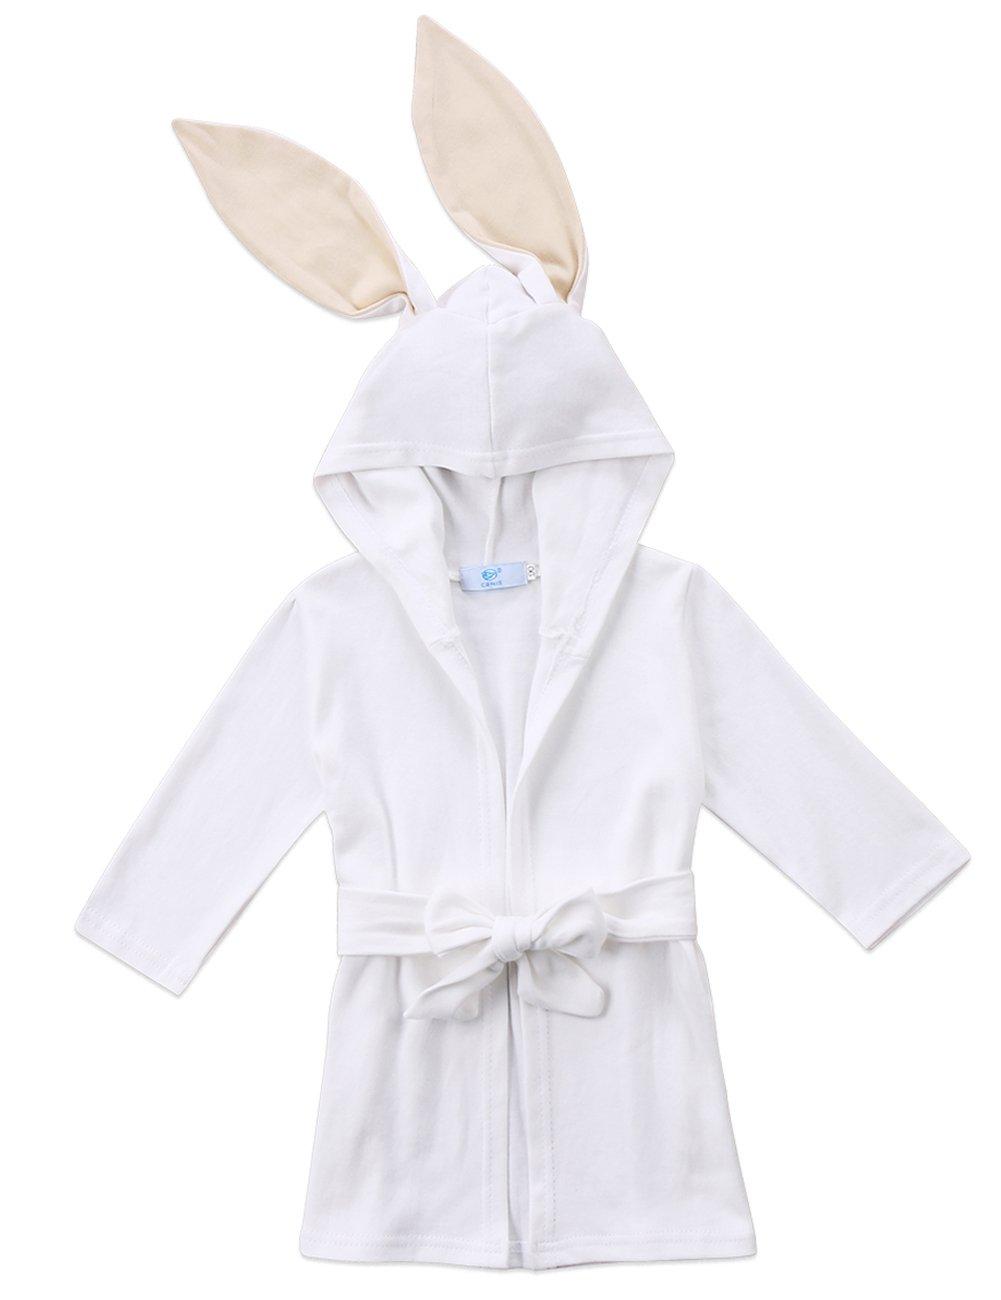 Baby Boys Girls Long Sleeve Hooded Bathrobes Cartoon Animal Rabbit Costume Pajamas